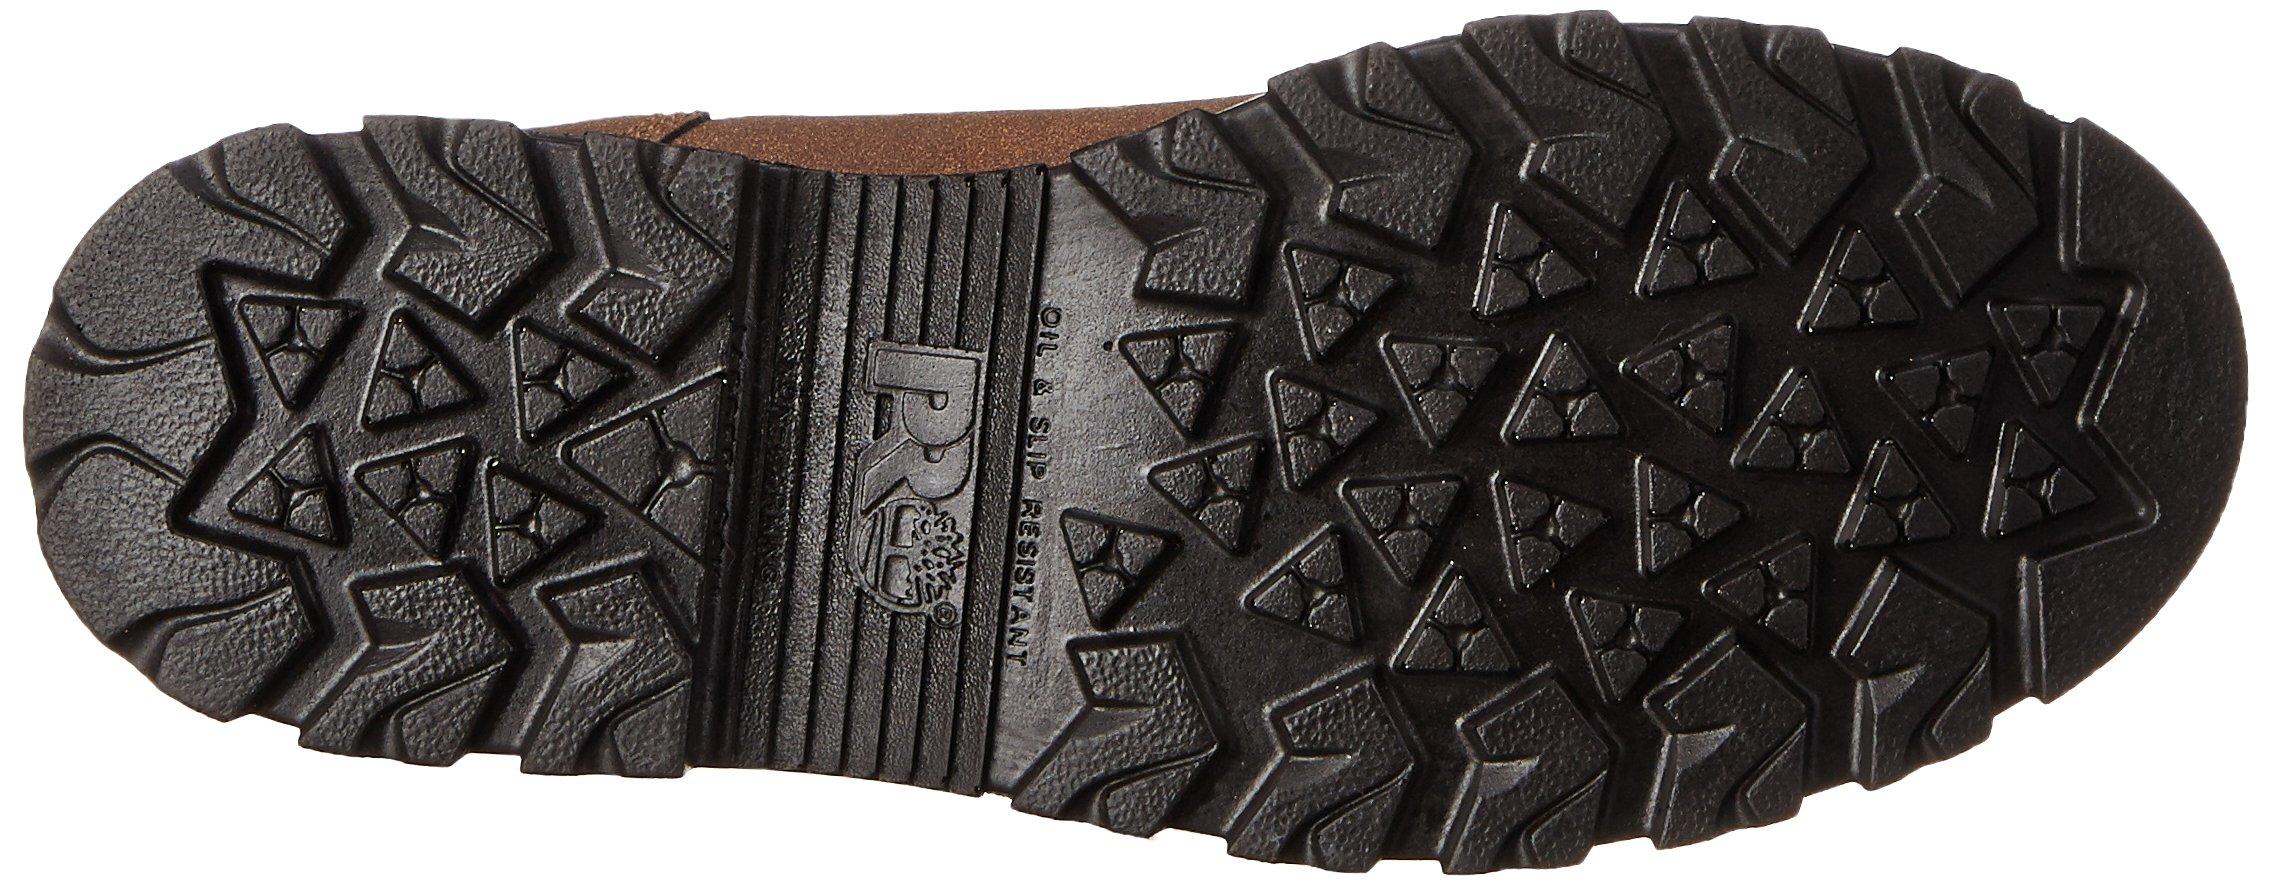 Timberland PRO Men's Rigmaster Wellington Work Shoe,Wheat Bandit,8.5 W US by Timberland PRO (Image #3)